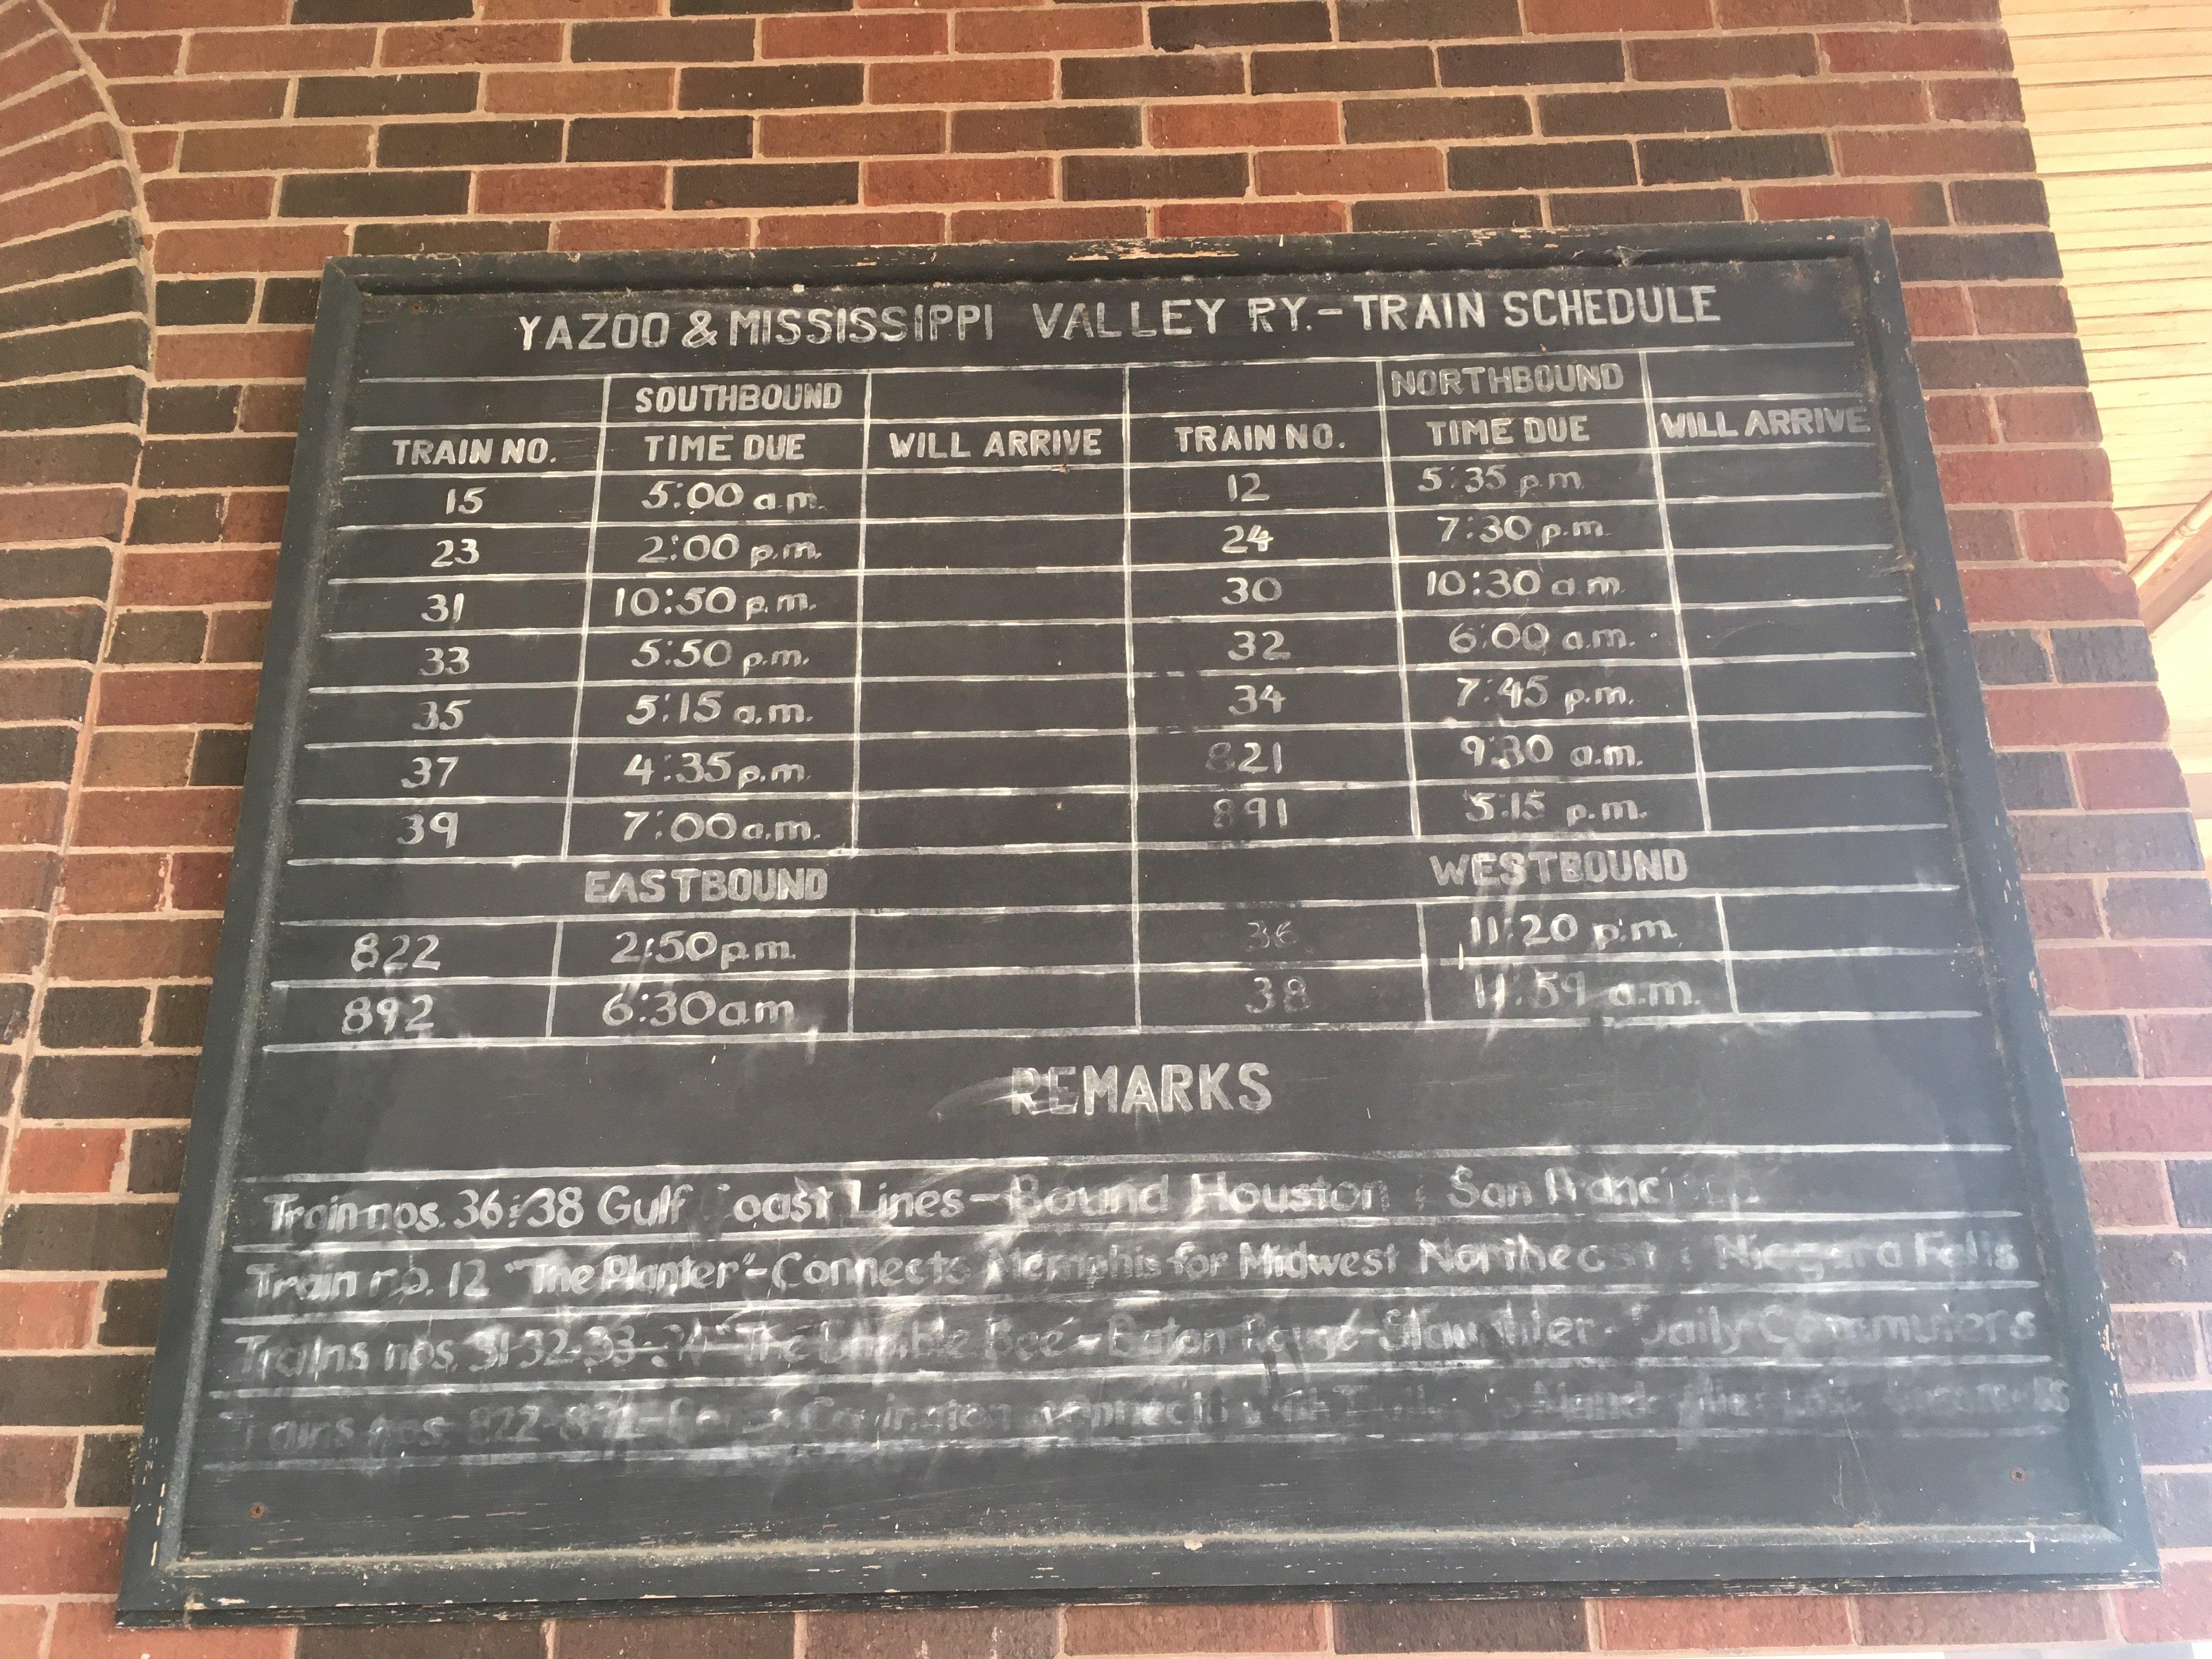 Yazoo & Mississippi Valley Train Schedule